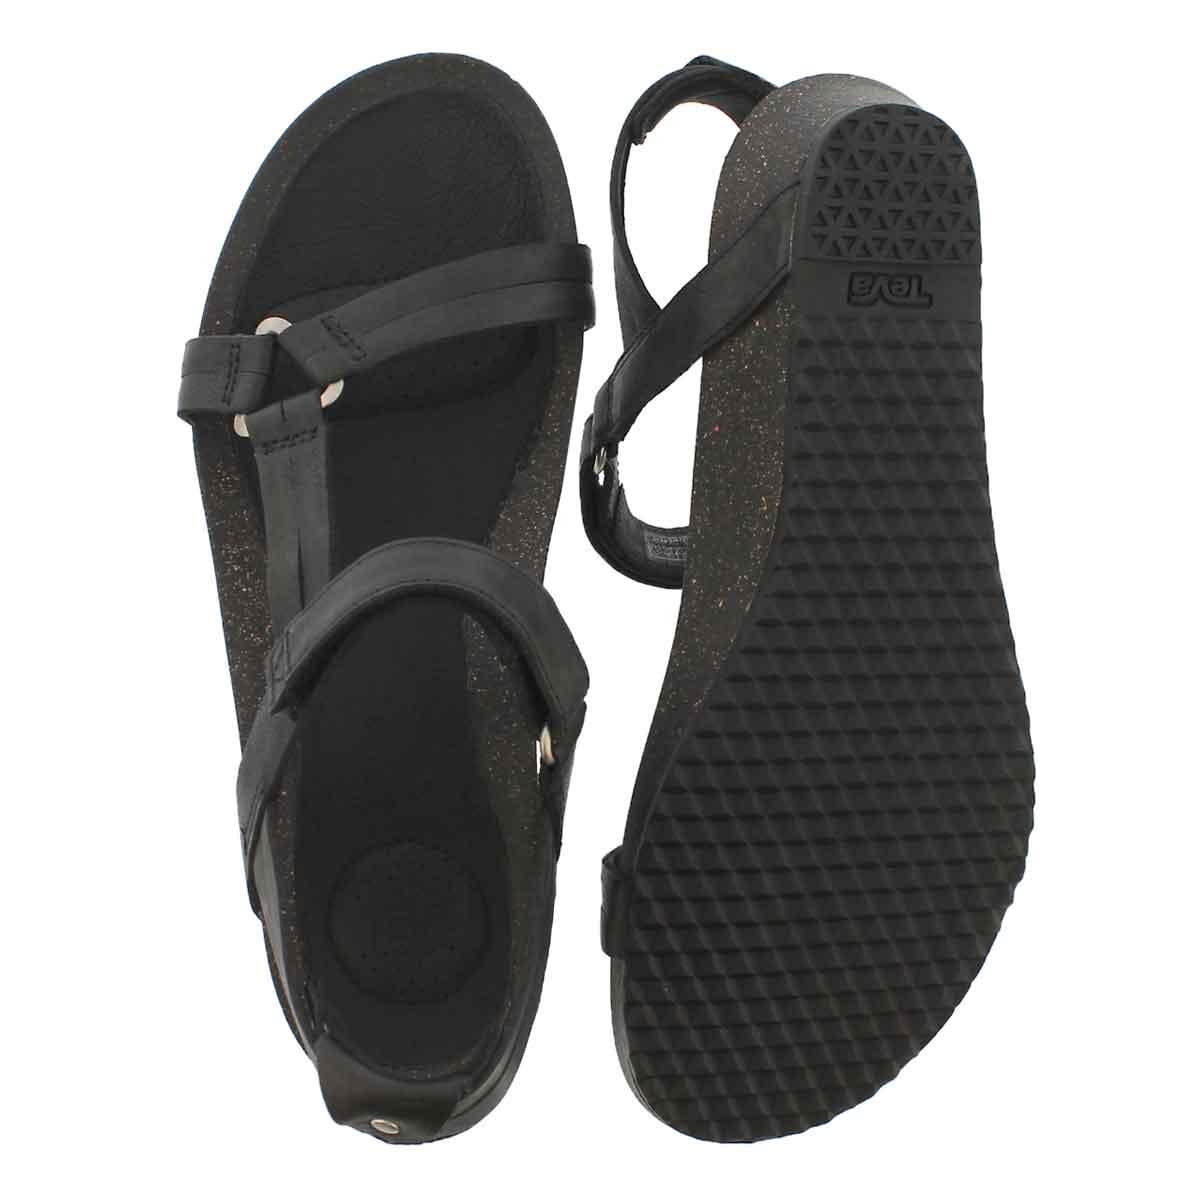 Lds Ysidro Universal black casual sandal